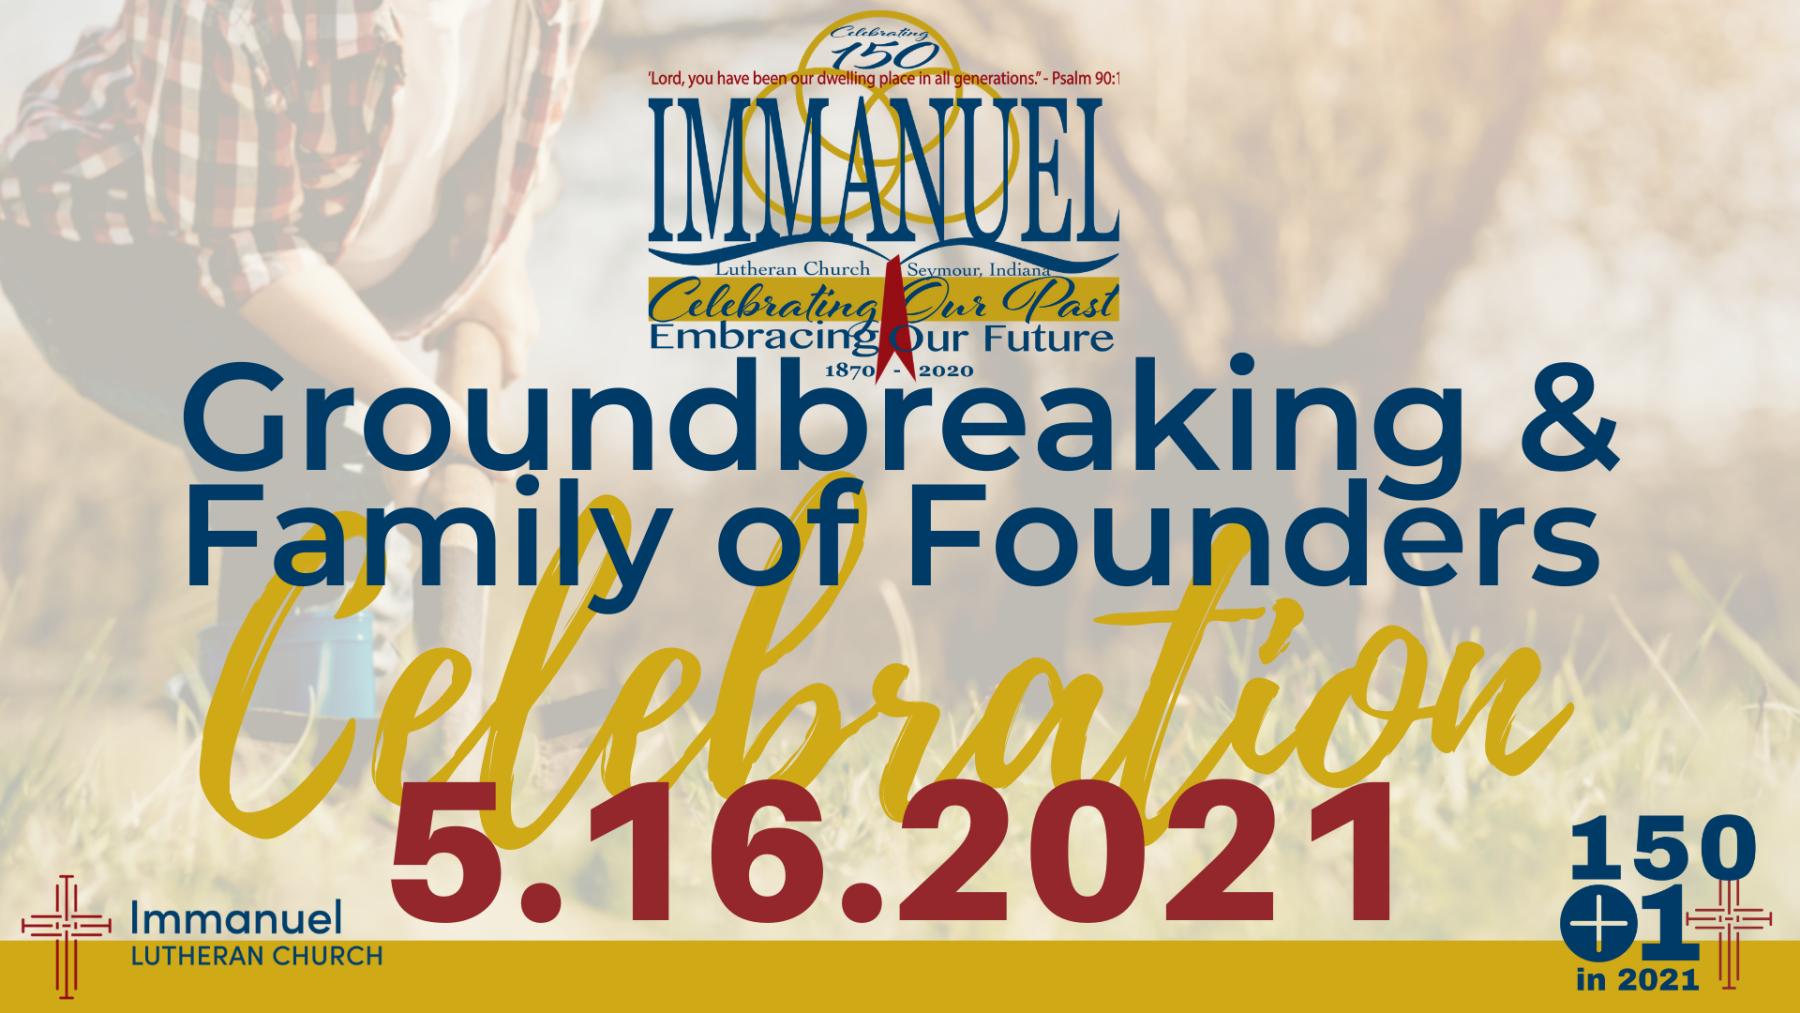 150 +1 Groundbreaking/Families of Founders Celebration